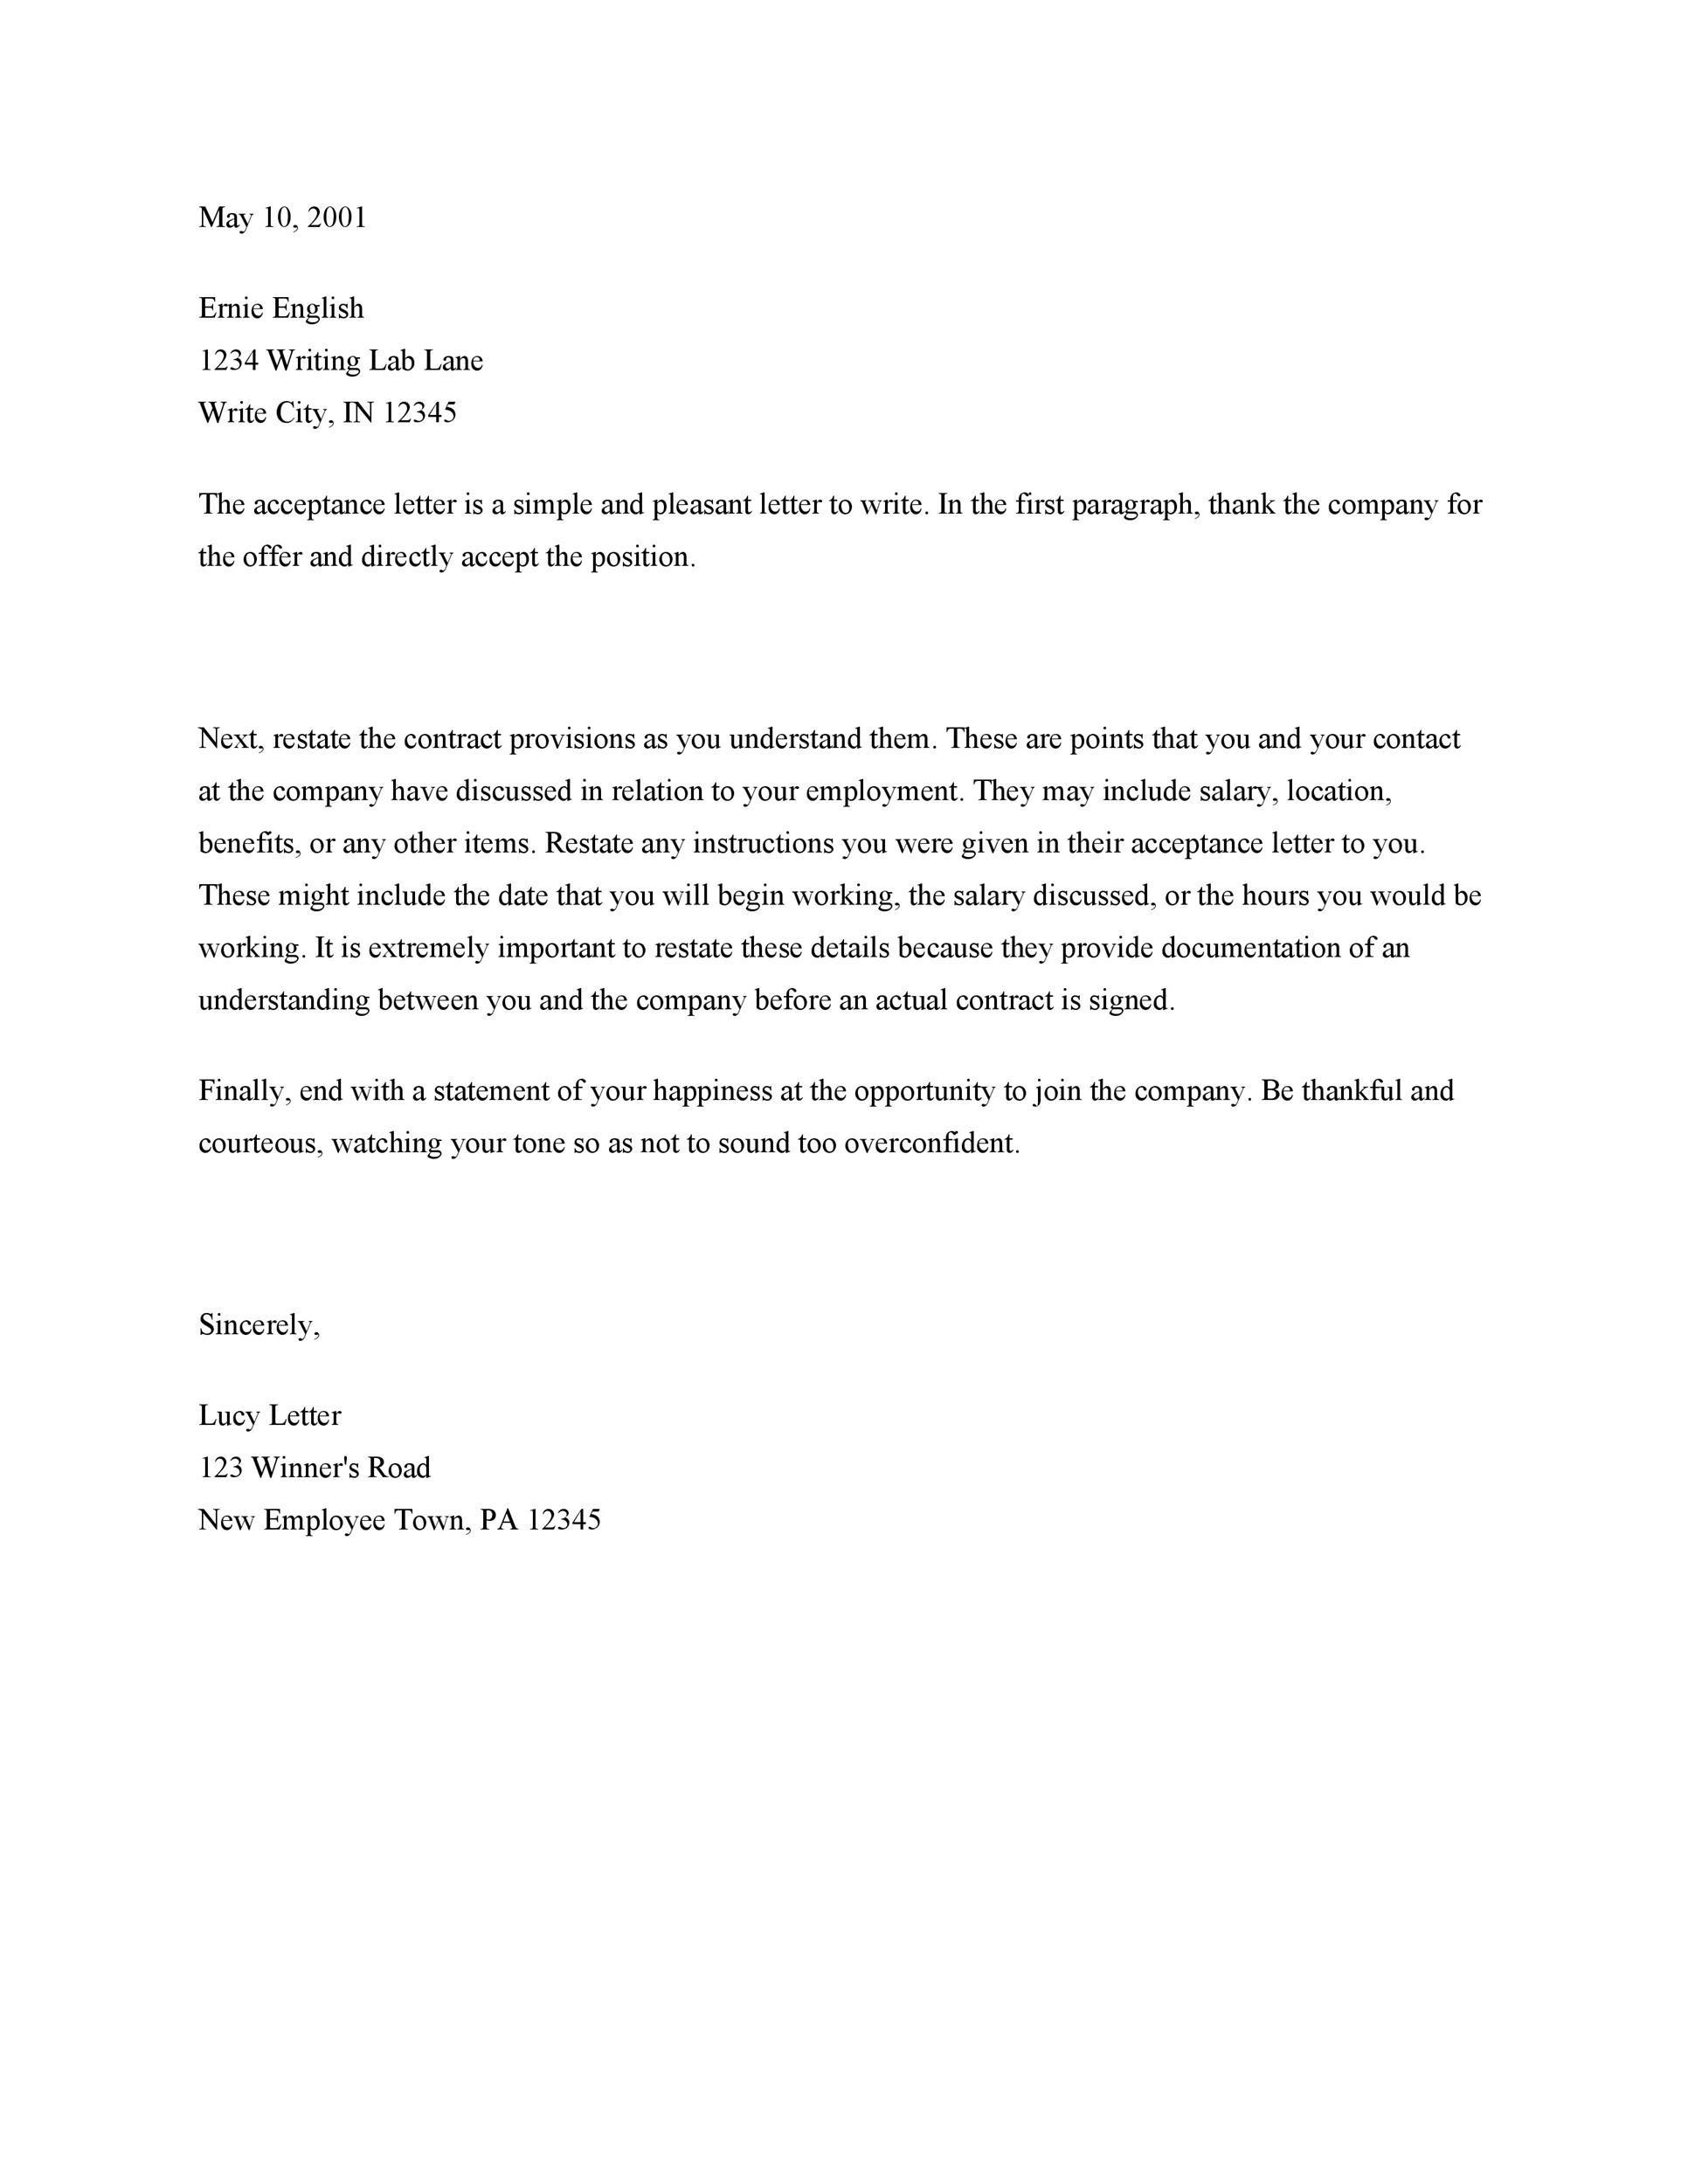 Free job acceptance letter 13